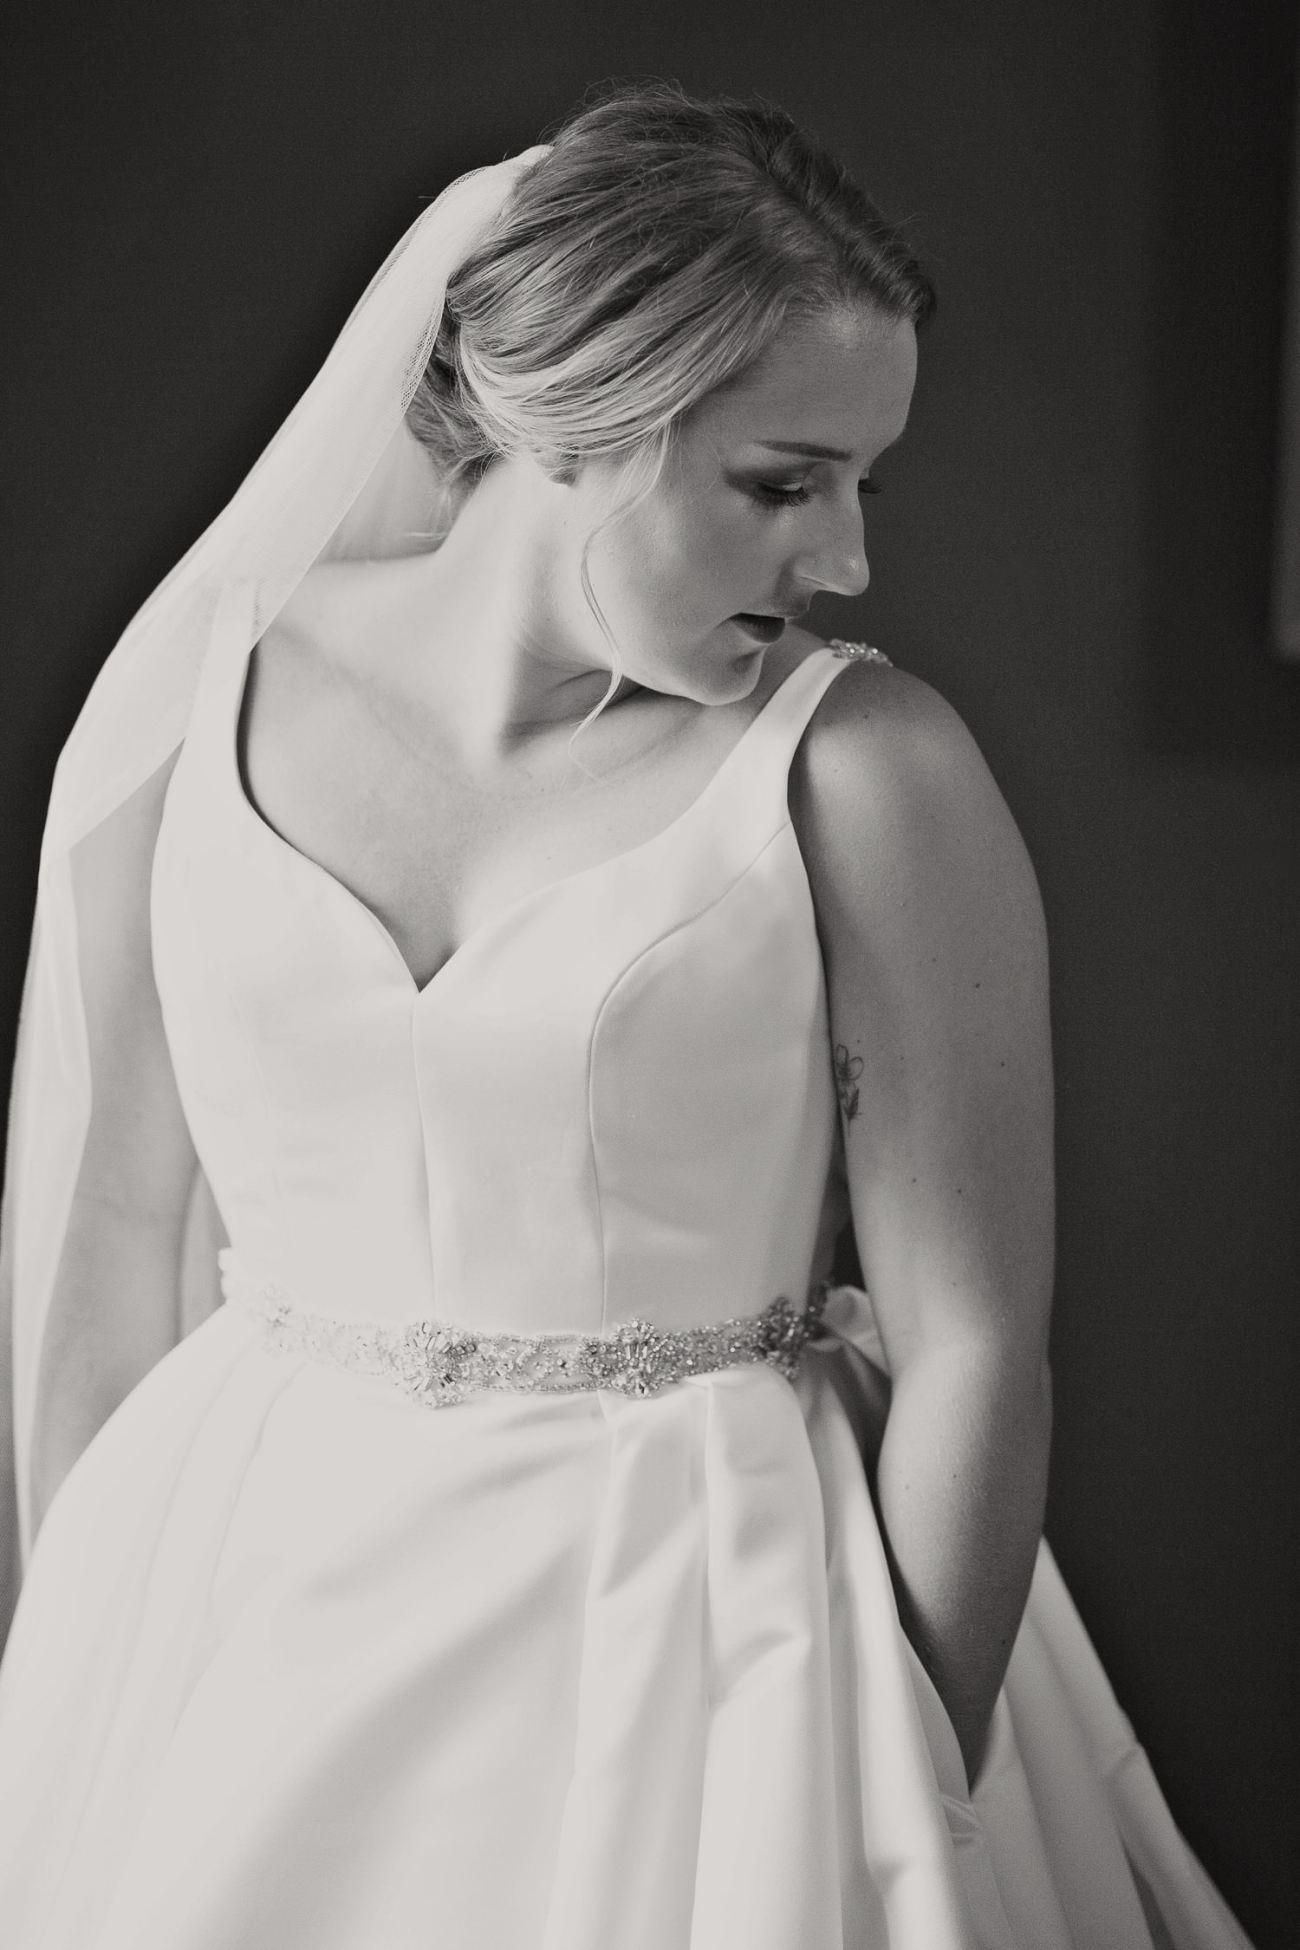 Bridal preparations before a Creekside Villa wedding captured by Tara Whittaker Photography